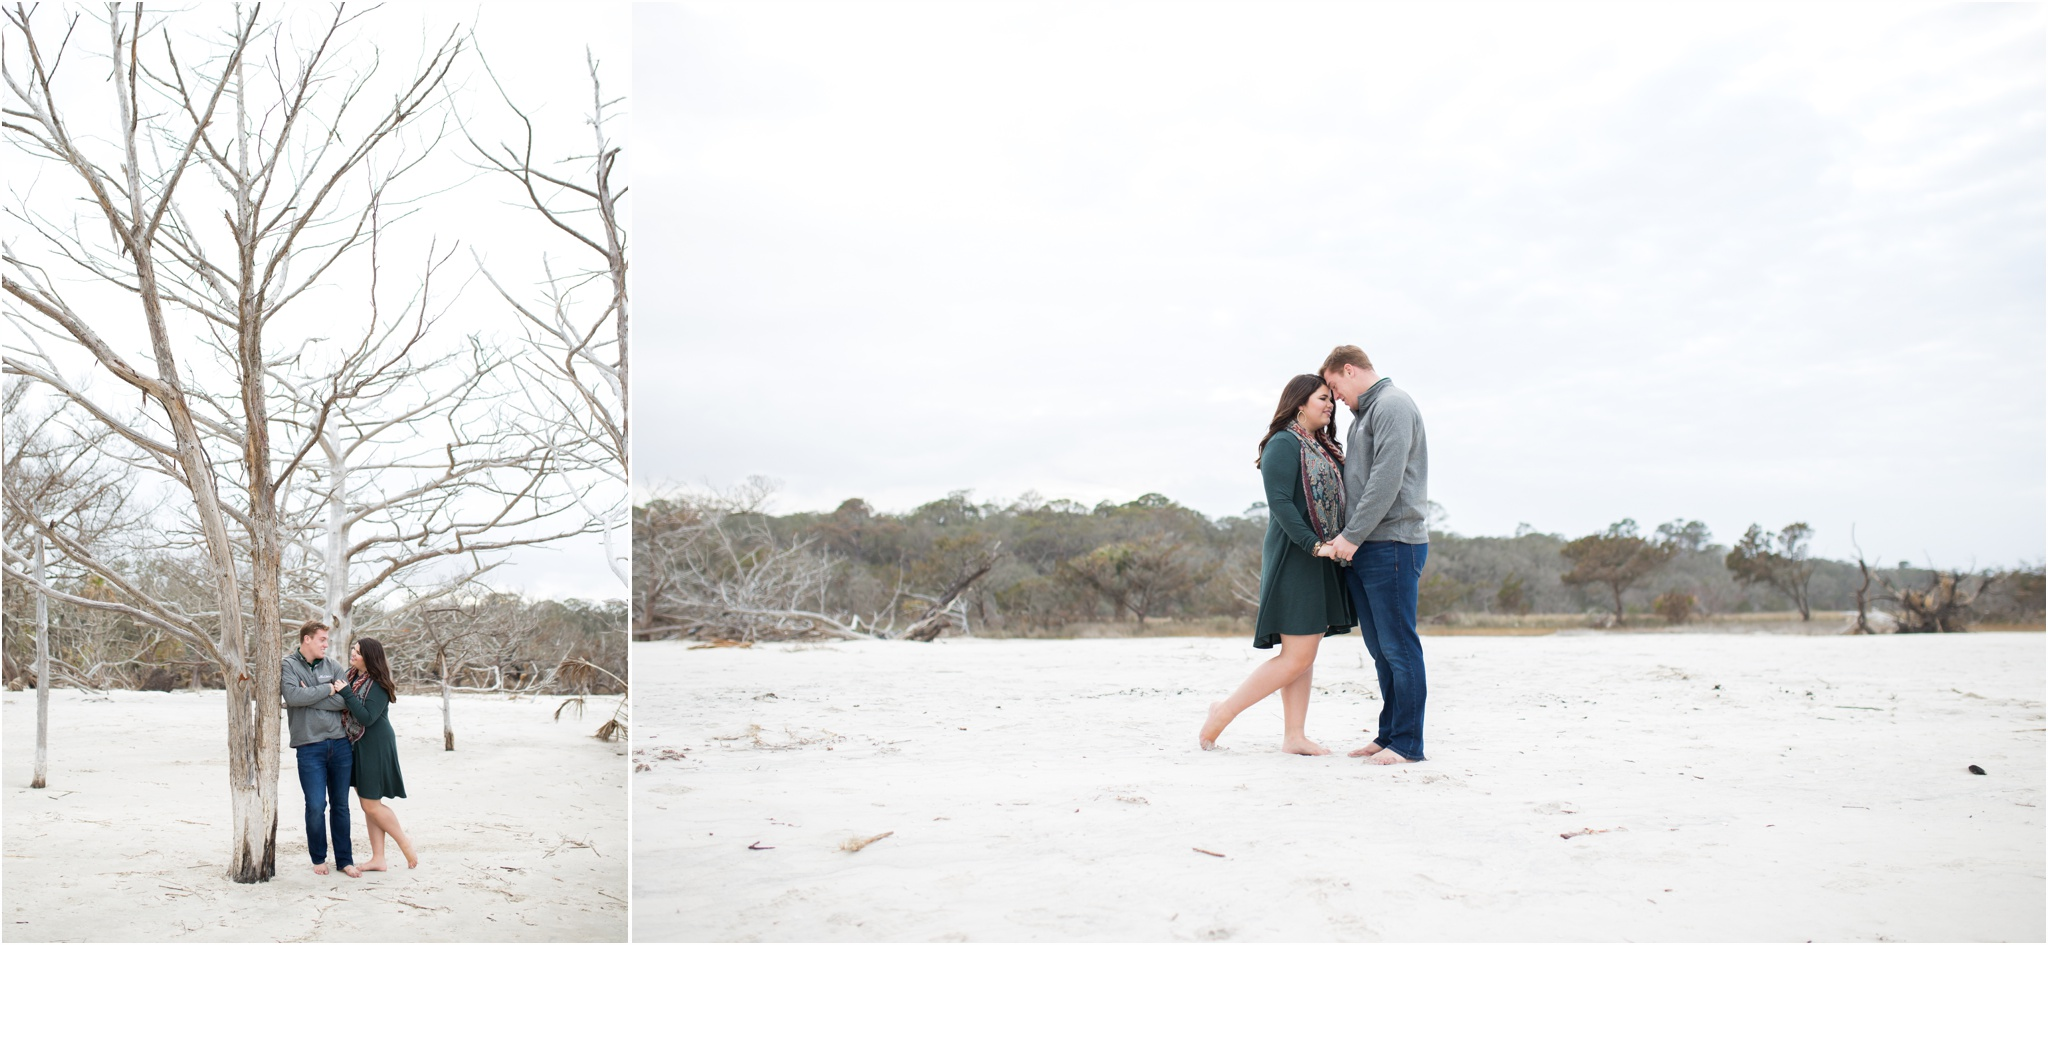 Rainey_Gregg_Photography_St._Simons_Island_Georgia_California_Wedding_Portrait_Photography_0595.jpg